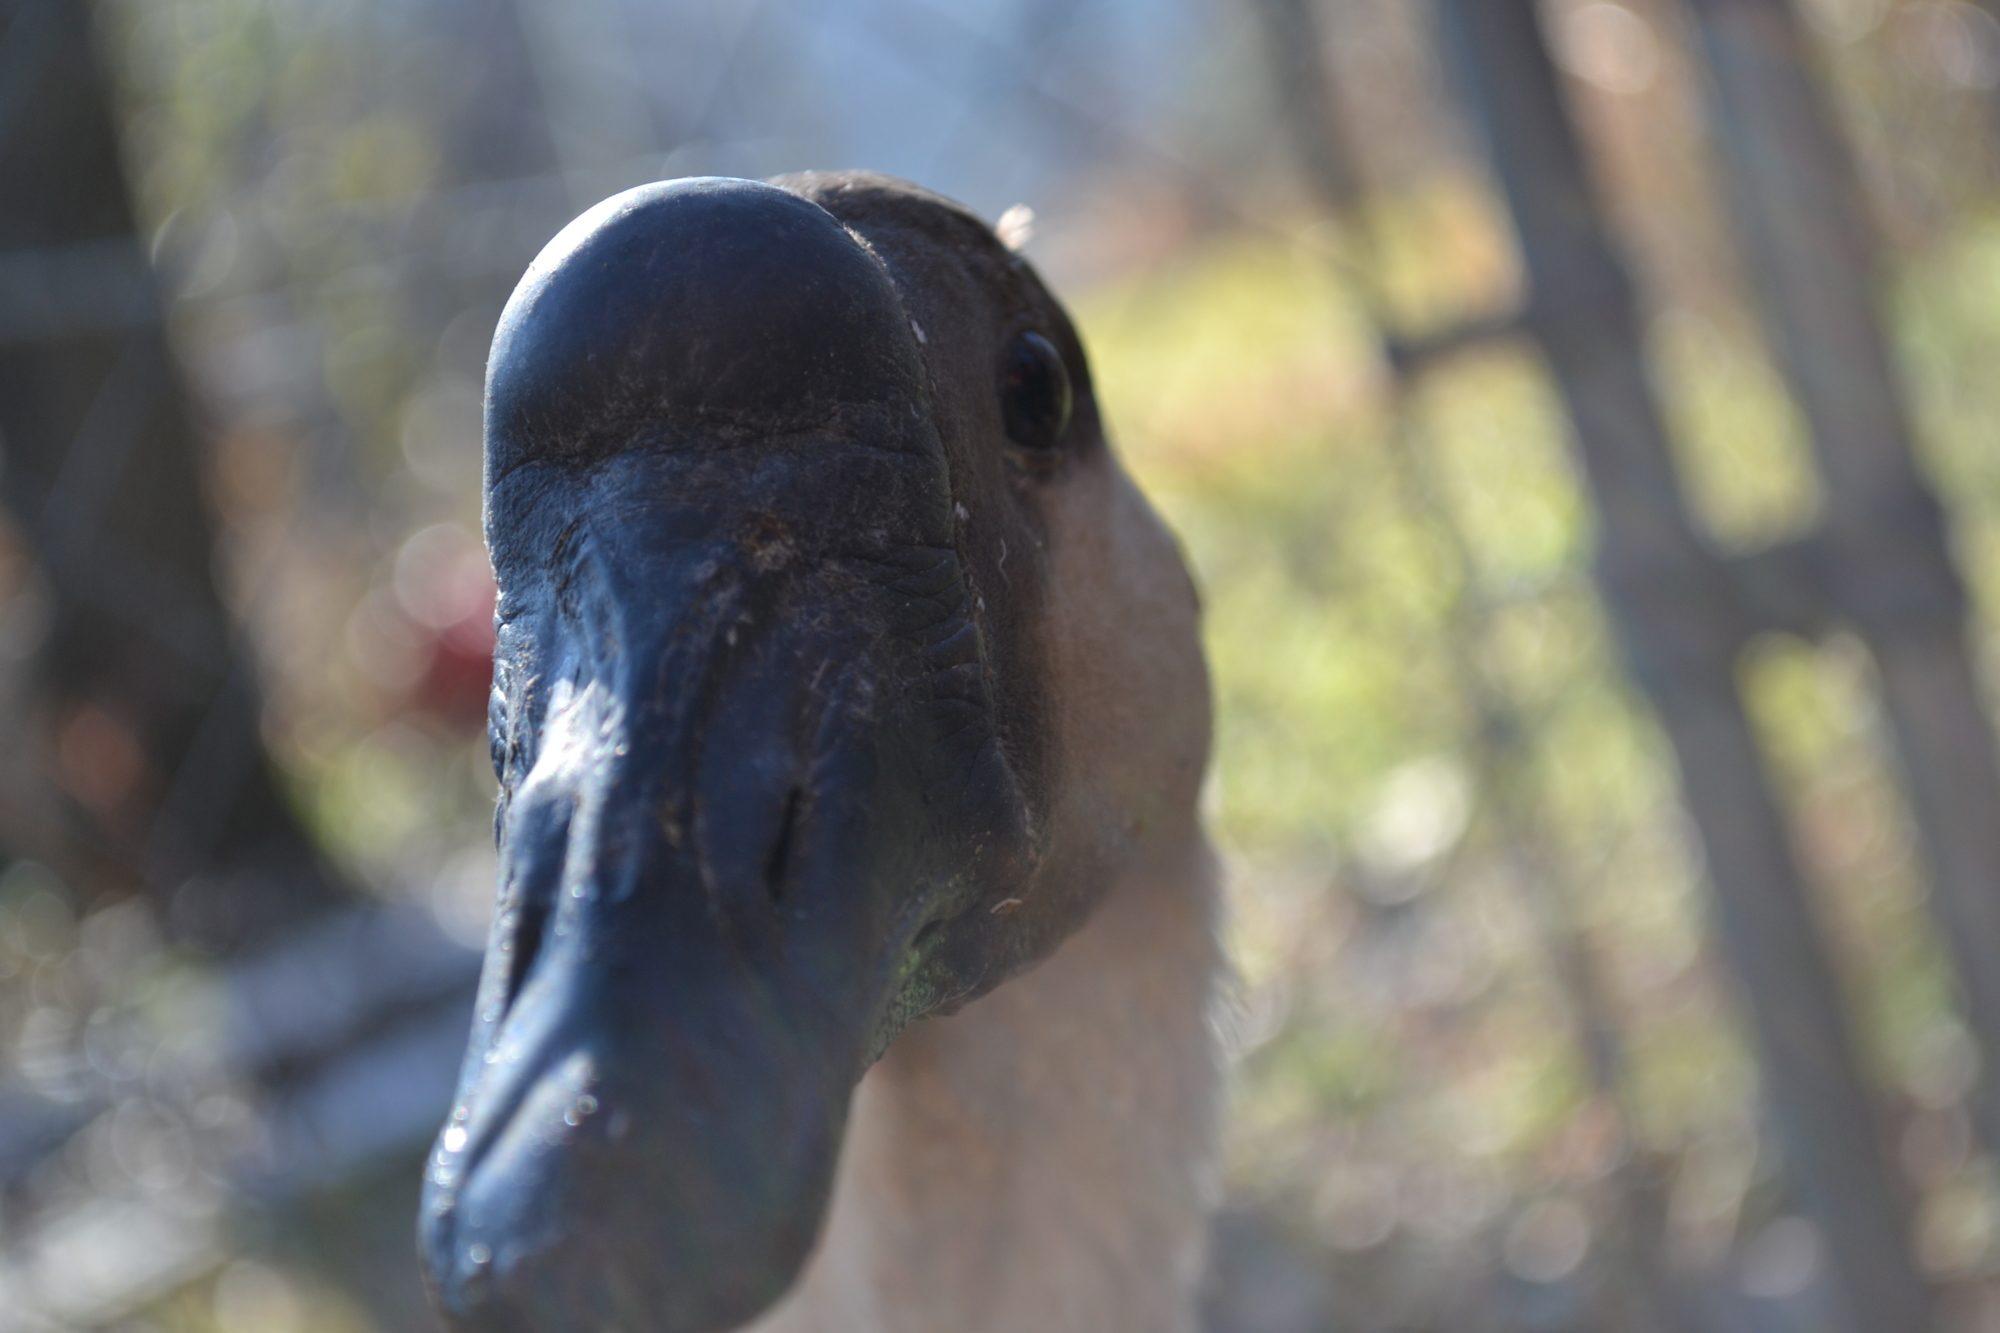 LeBlackbird's photos in Geese Breed Focus - African